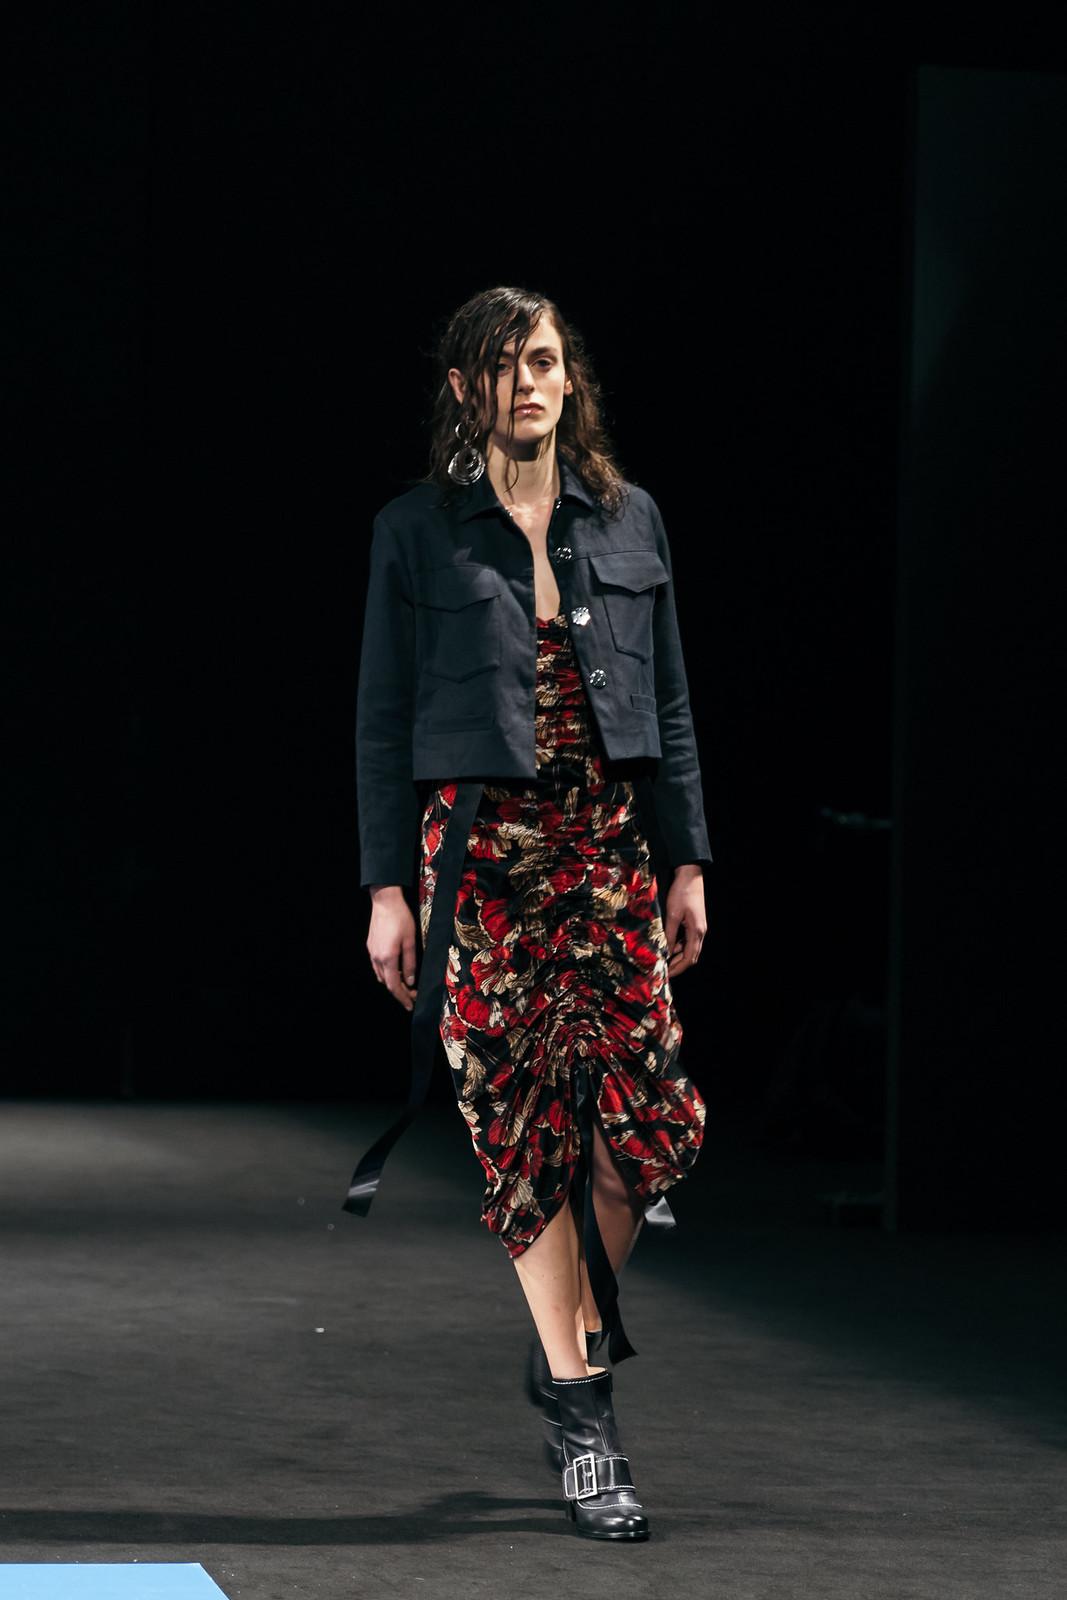 Jessie Chanes - Seams for a desire - 080 Bacelona Fashion #080bcnfasion -44